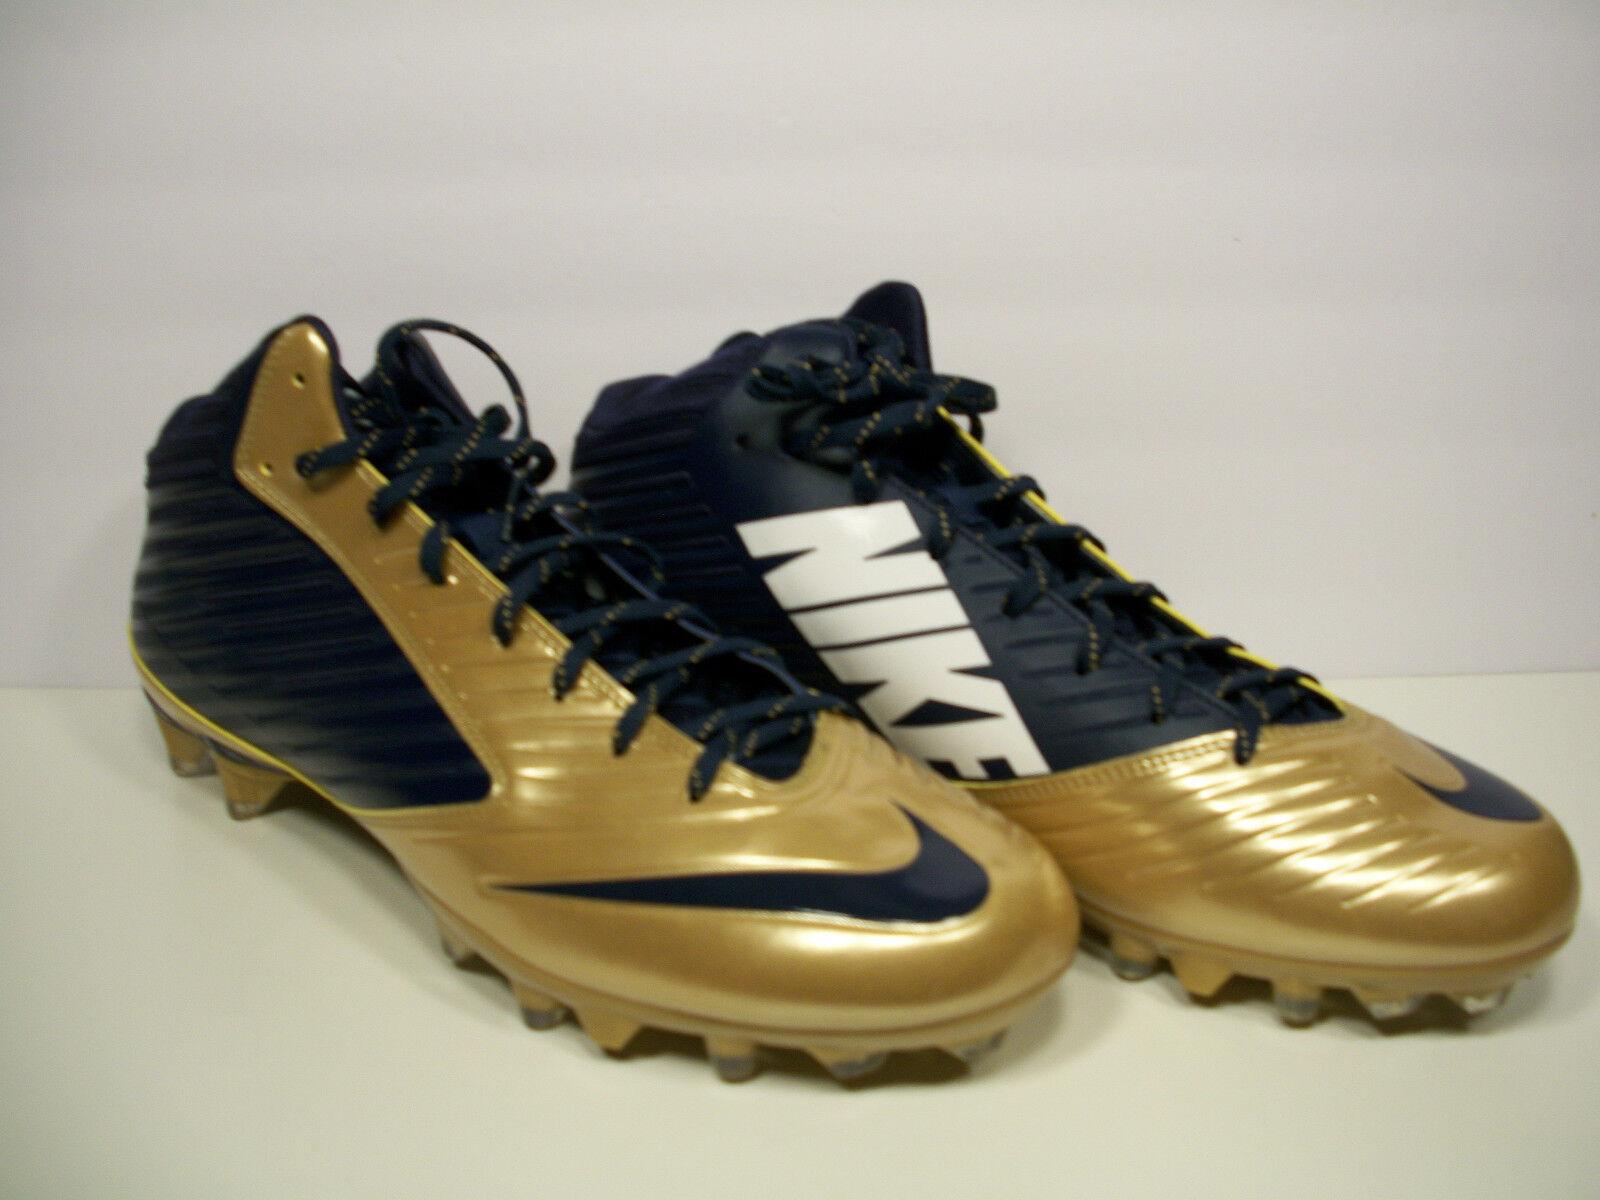 NIKE Vapor Speed 3 4 TD Football Cleats 668839-426 Navy bluee gold Size 16